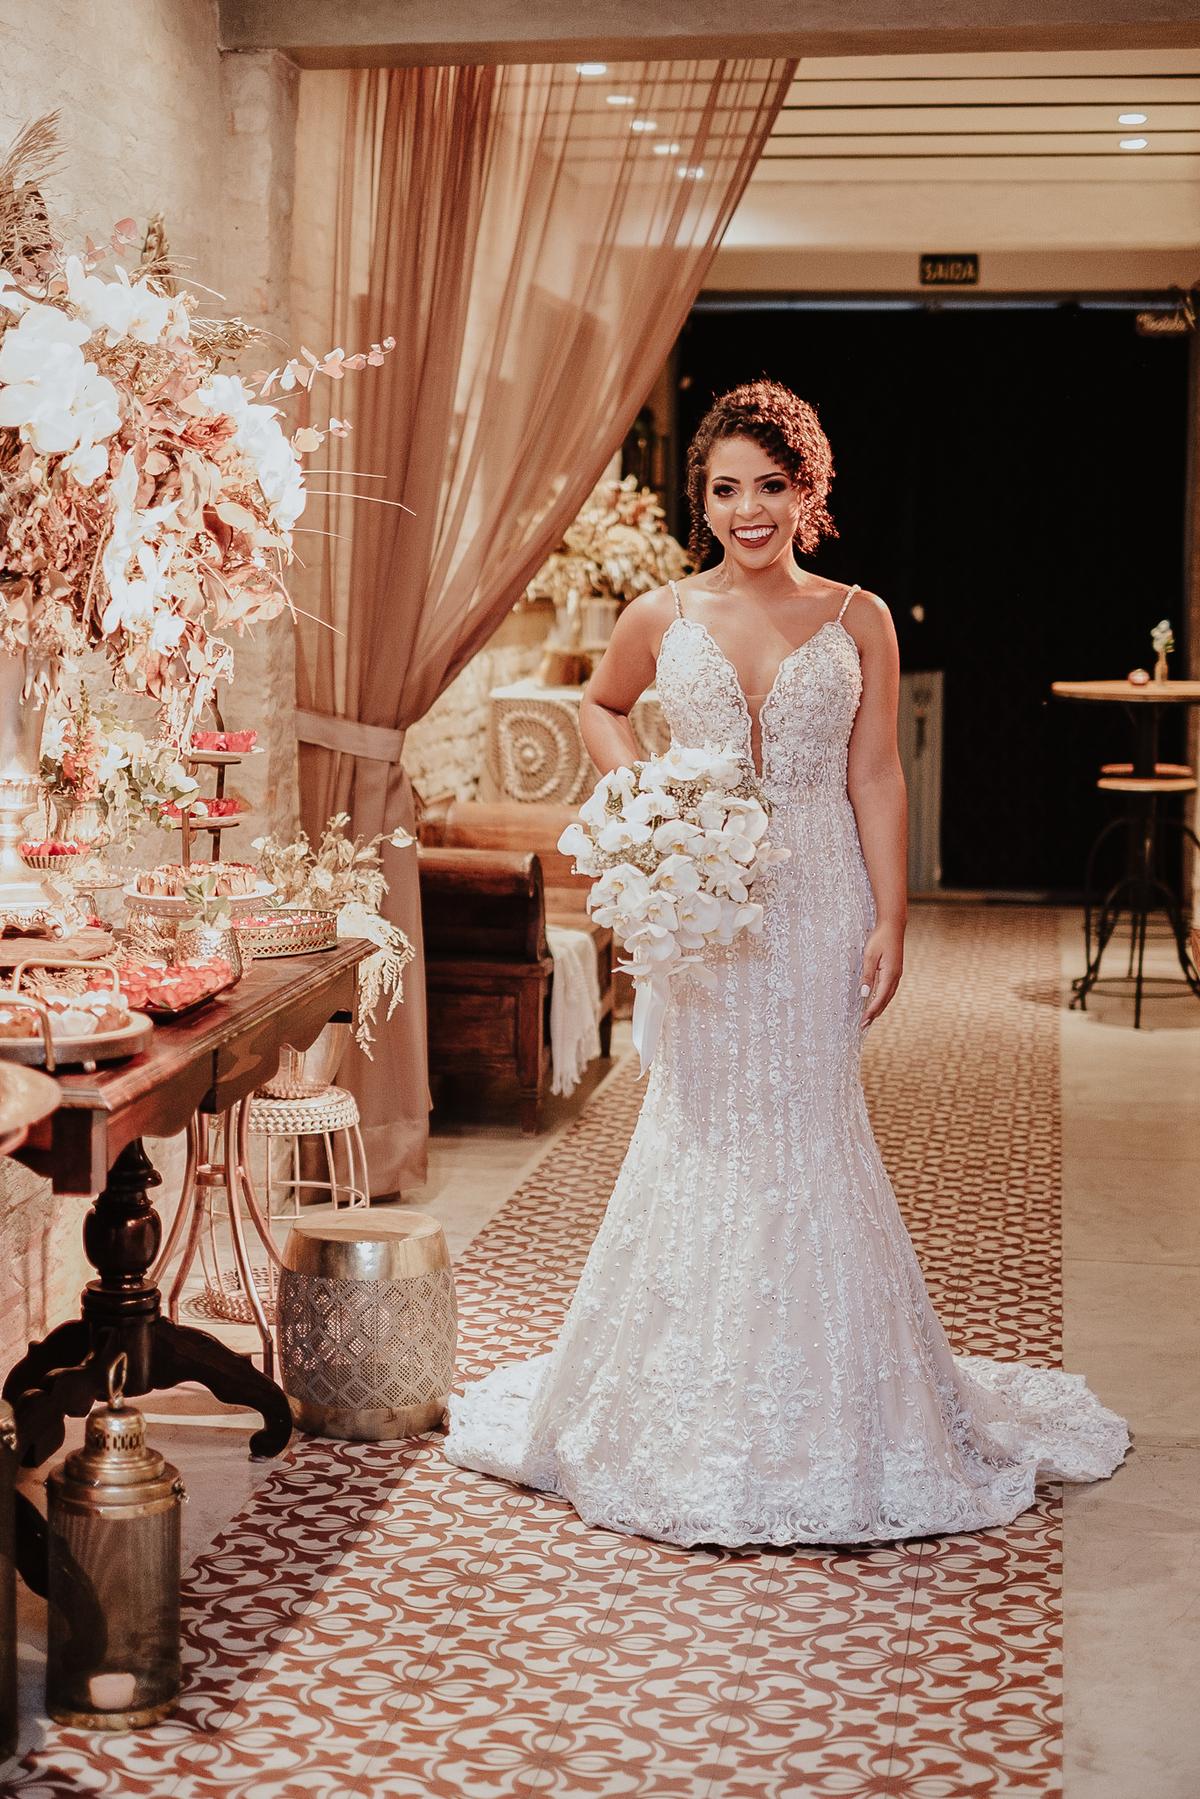 casamentos boho chic intimista na casa quena entrada da noiva vestido de noiva fotografia de casamento por caio henrique